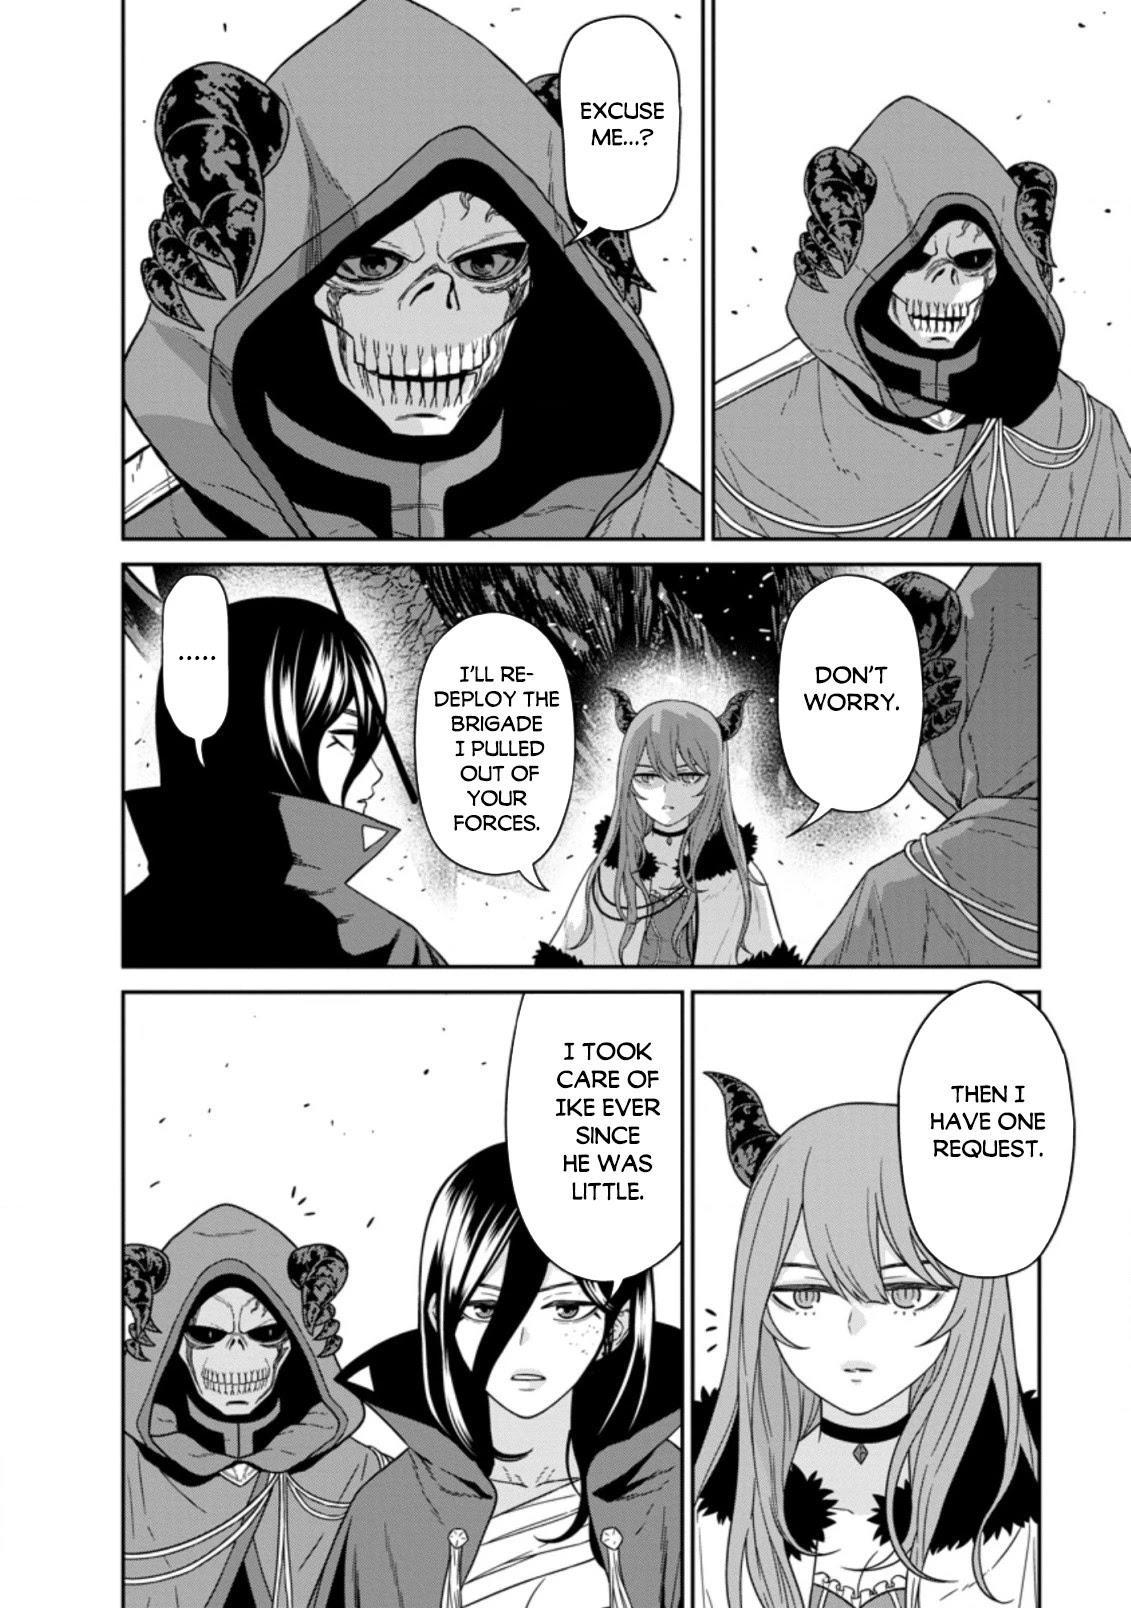 Maou Gun Saikyou No Majutsushi Wa Ningen Datta Chapter 19.1 page 12 - Mangakakalots.com